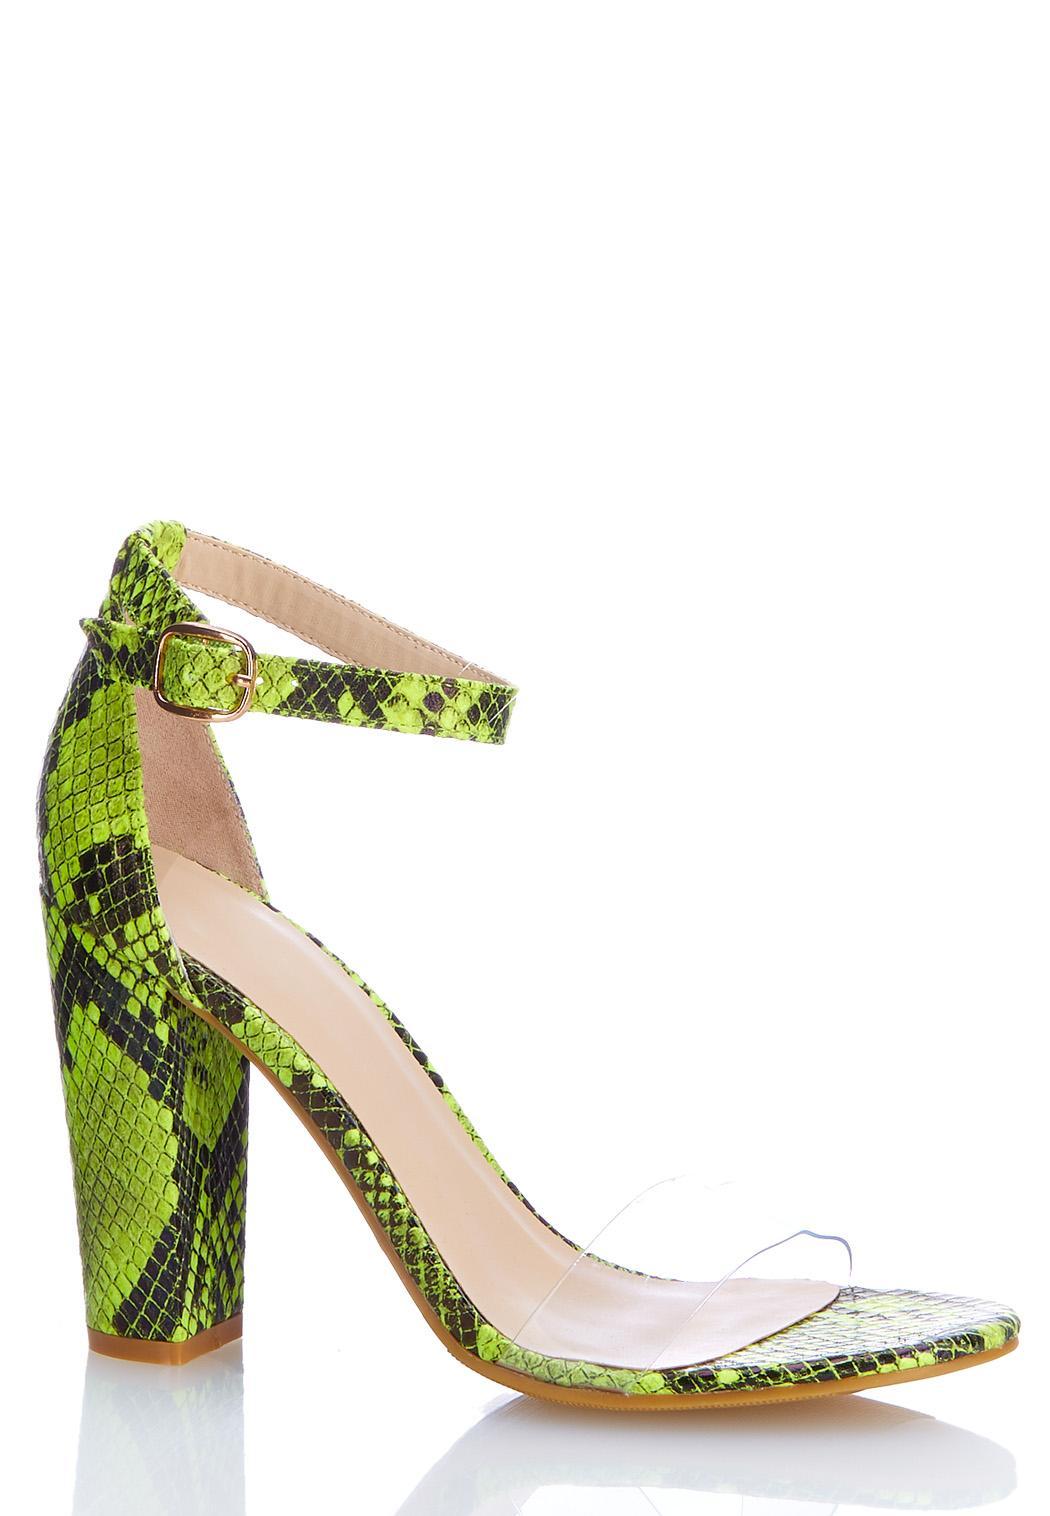 Lucite Strap Snakeskin Heeled Sandals